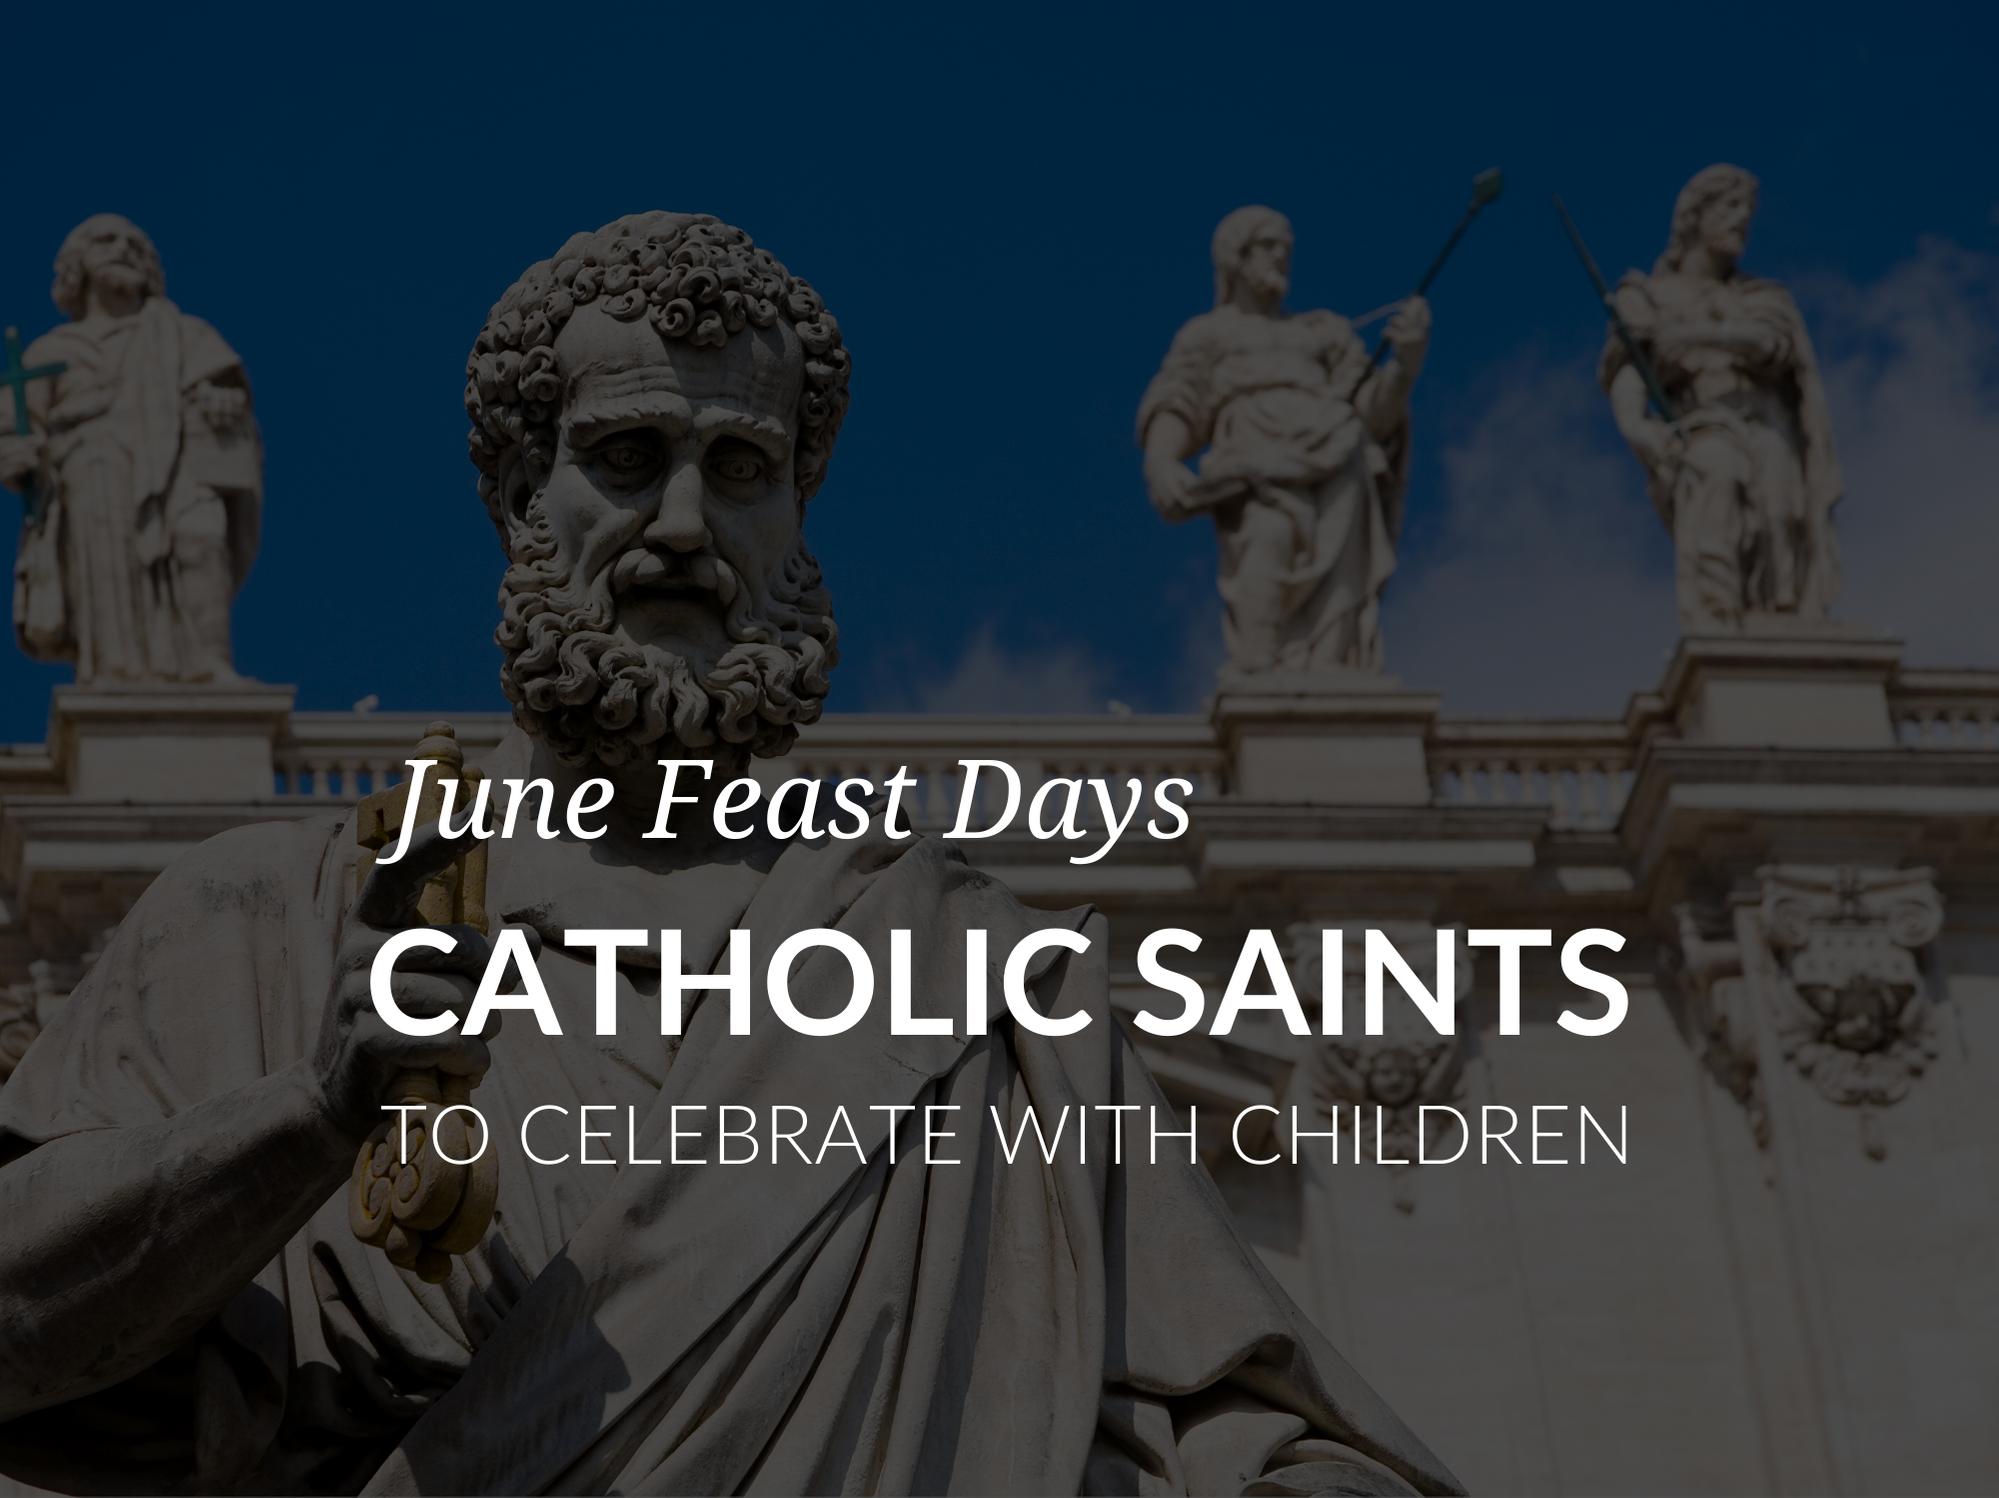 june-feast-days-popular-saints-for-kids-catholic-saints